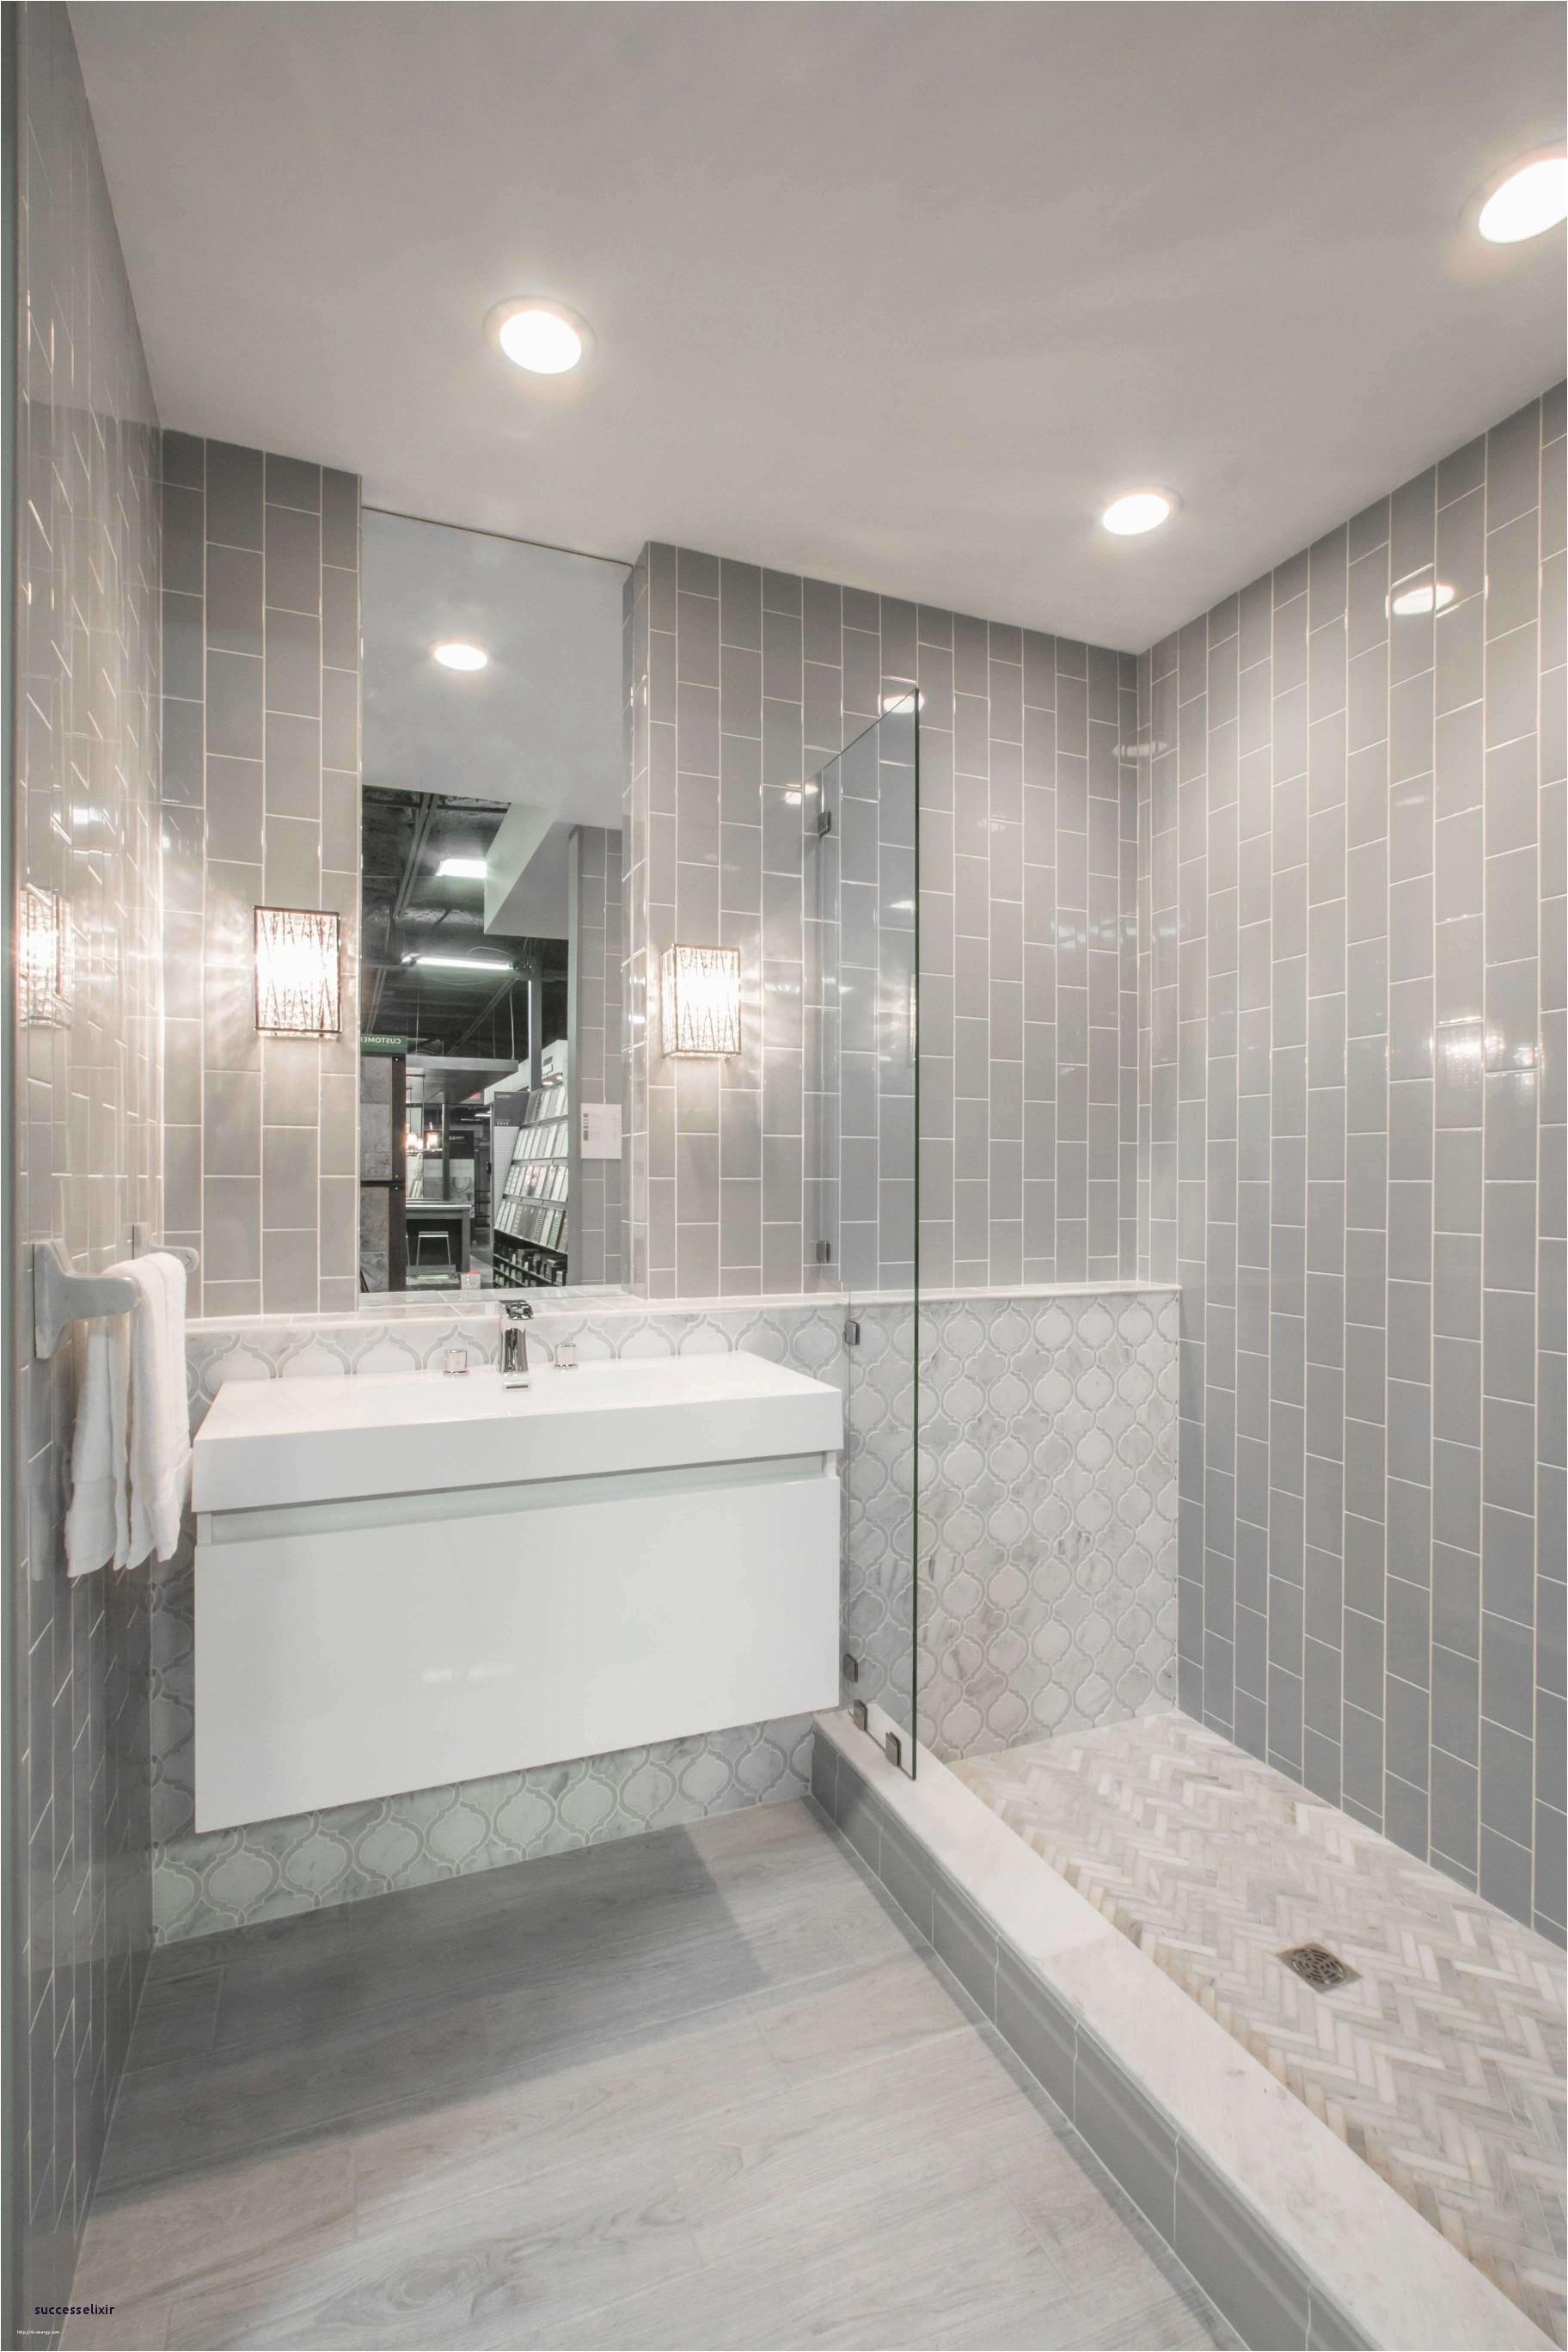 4 by 6 Bathroom Design New White Bathroom Designs Fresh Grey Bathroom 0d Archives Modern House 27 top Bathroom Ideas Uk